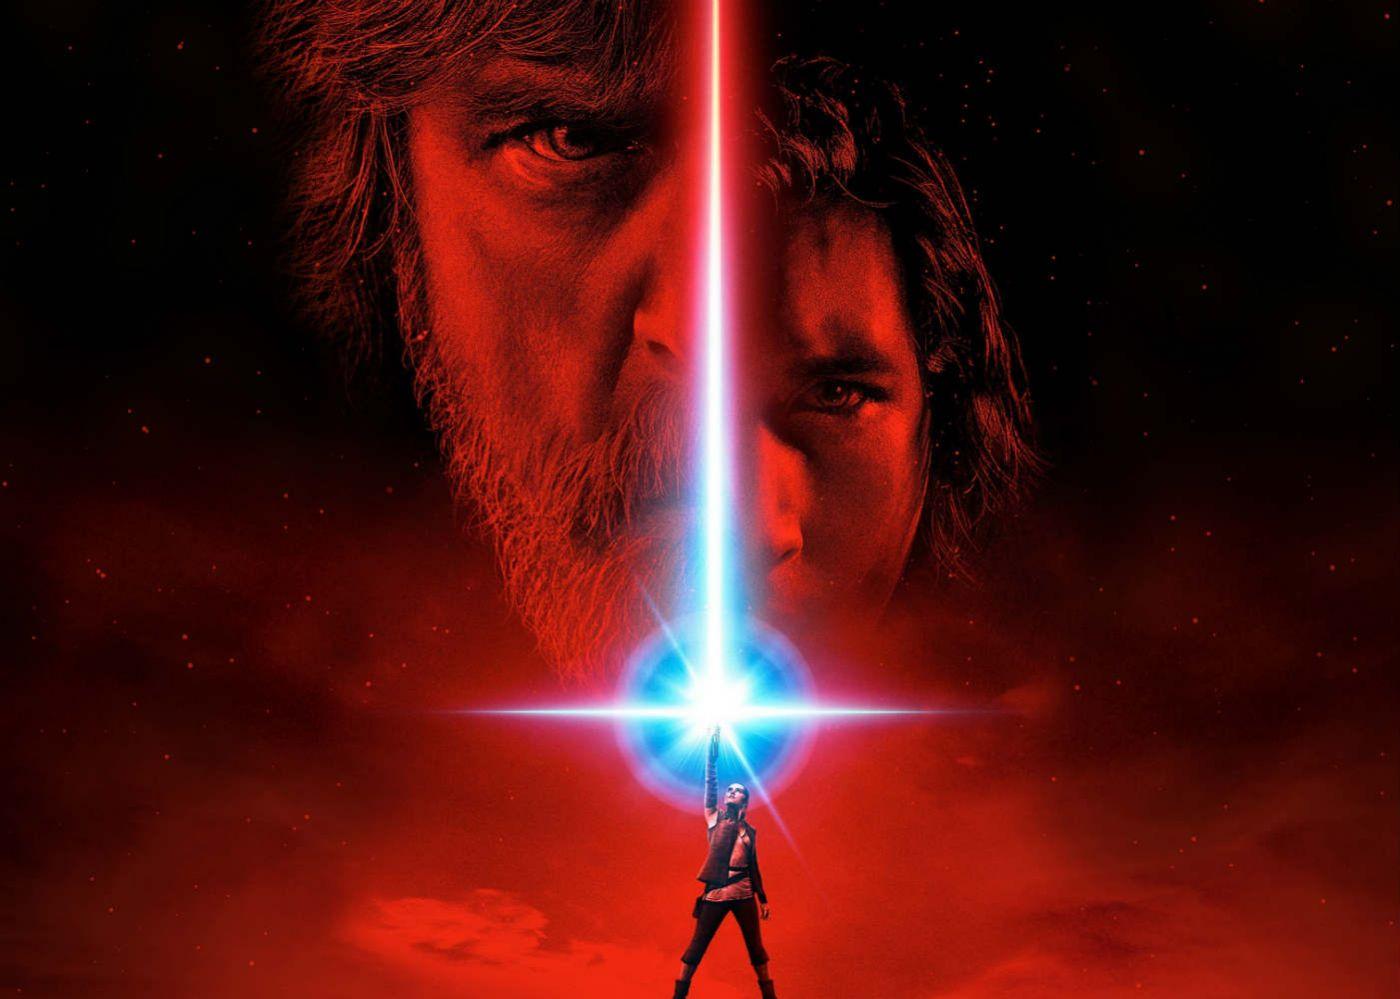 Vanity Fair Reveals Star Wars: The Last Jedi Covers